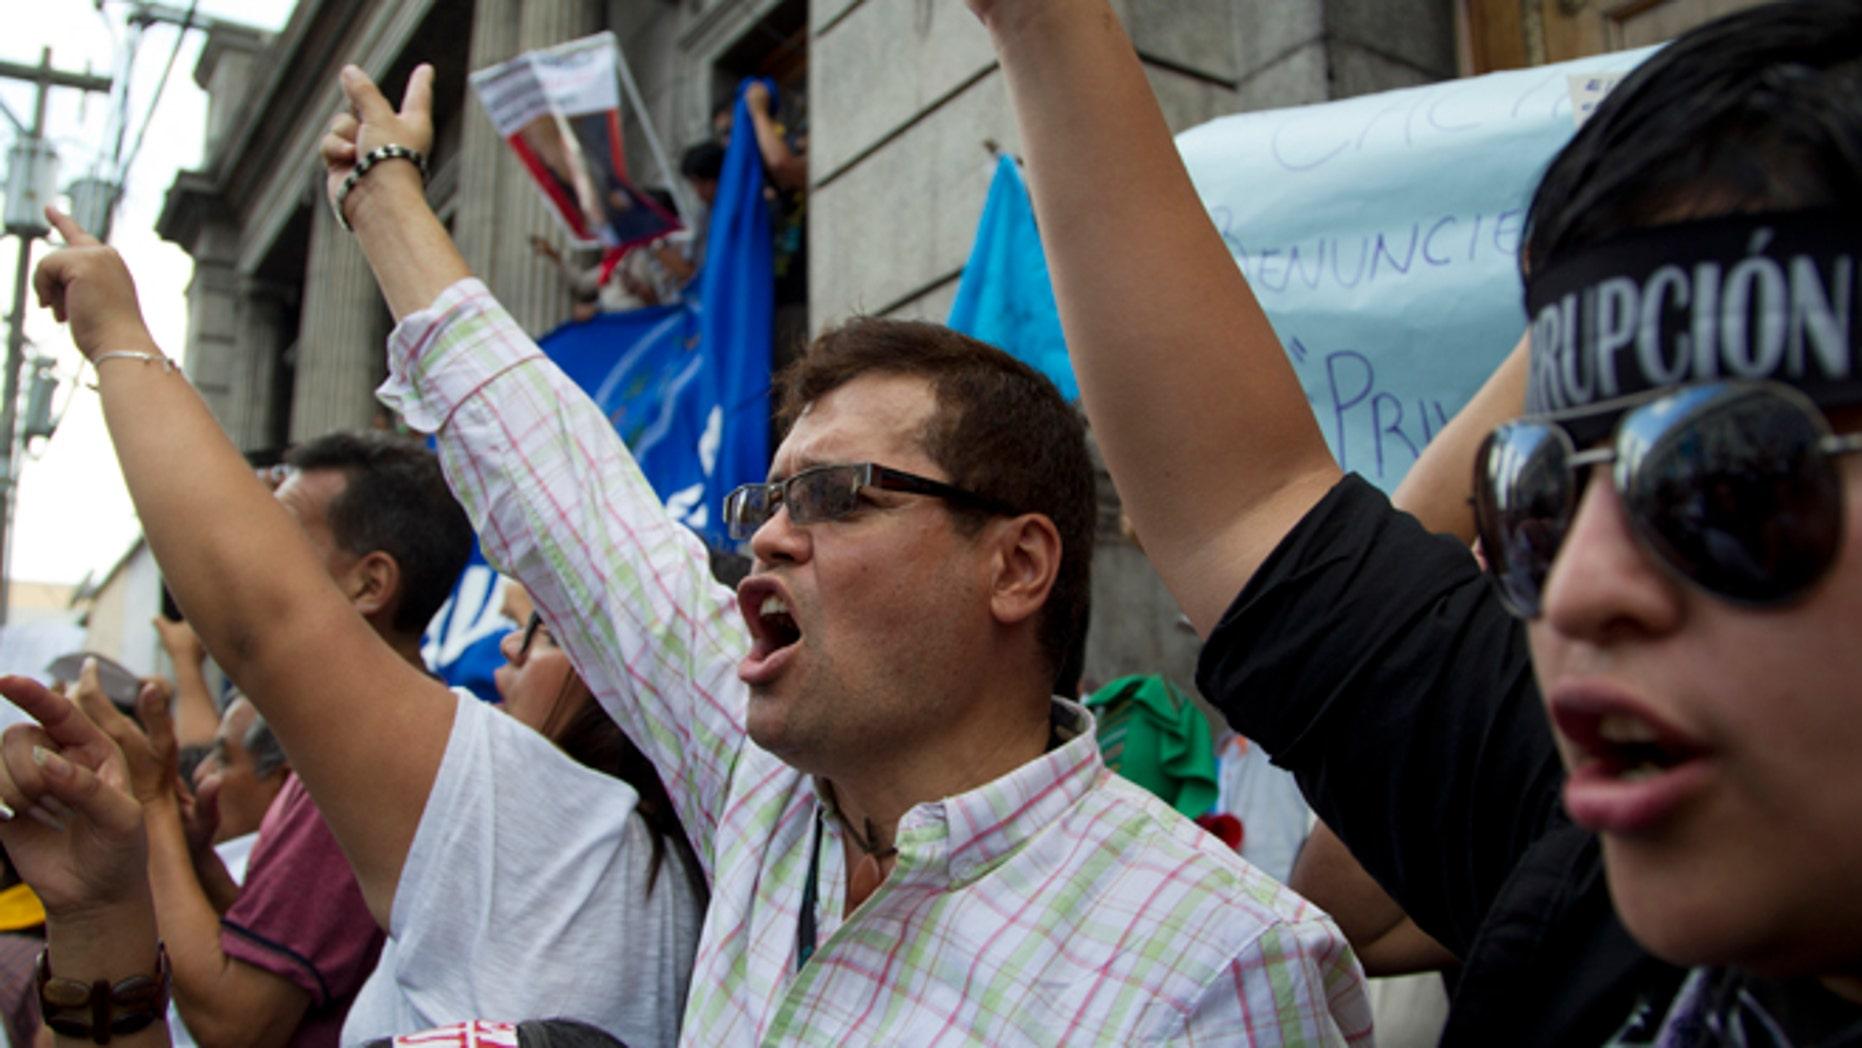 Protesters demand the resignation of Guatemalan President Otto Perez Molina Saturday, May 9, 2015.